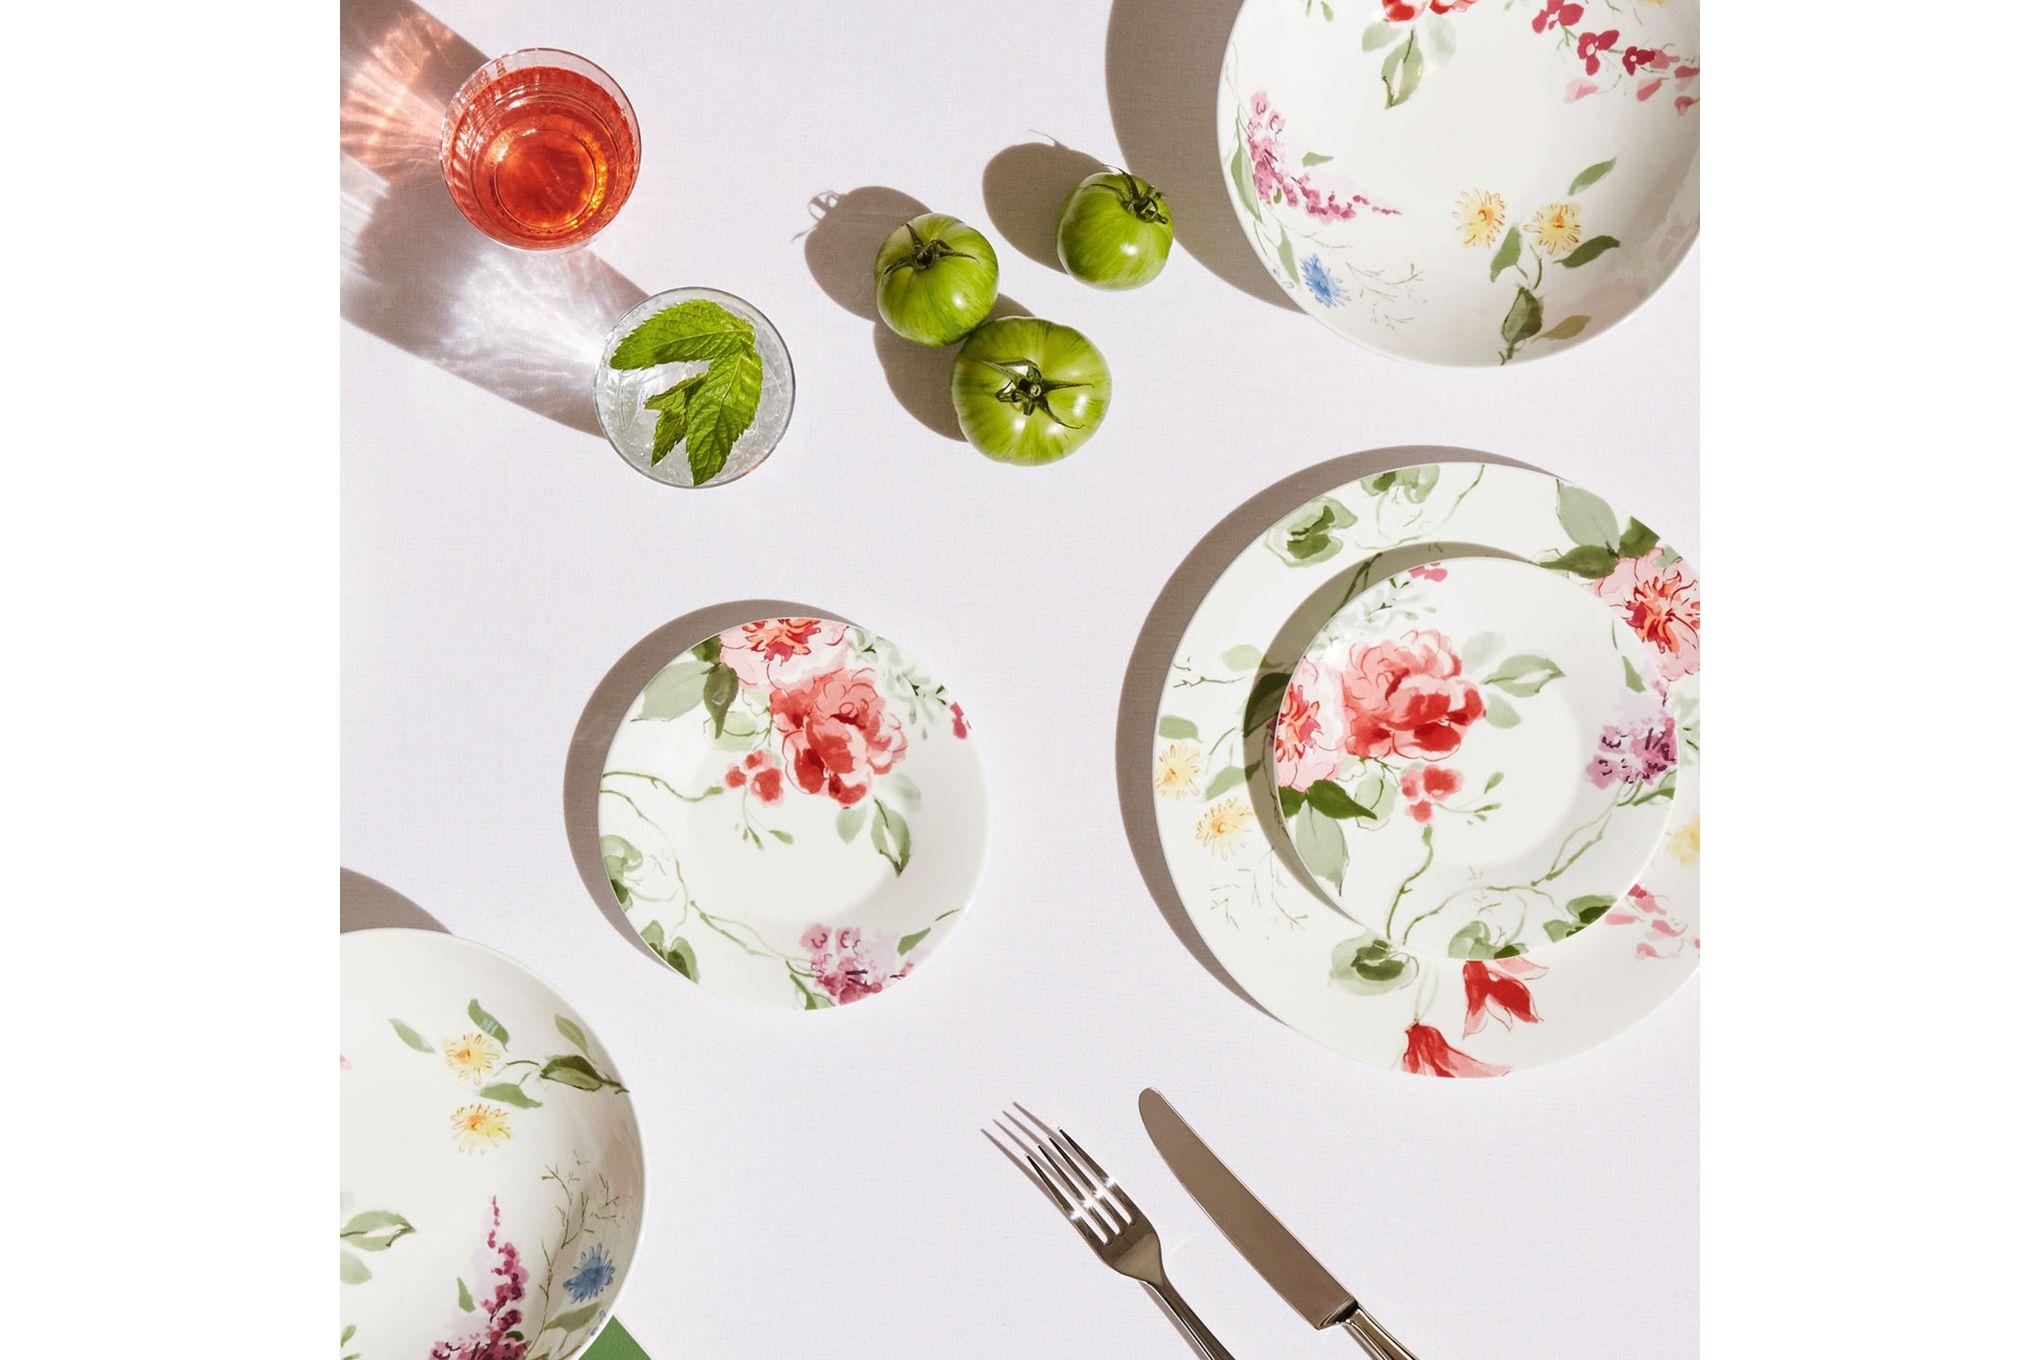 Jasper Conran for Wedgwood Floral Side Plate 23cm thumb 2